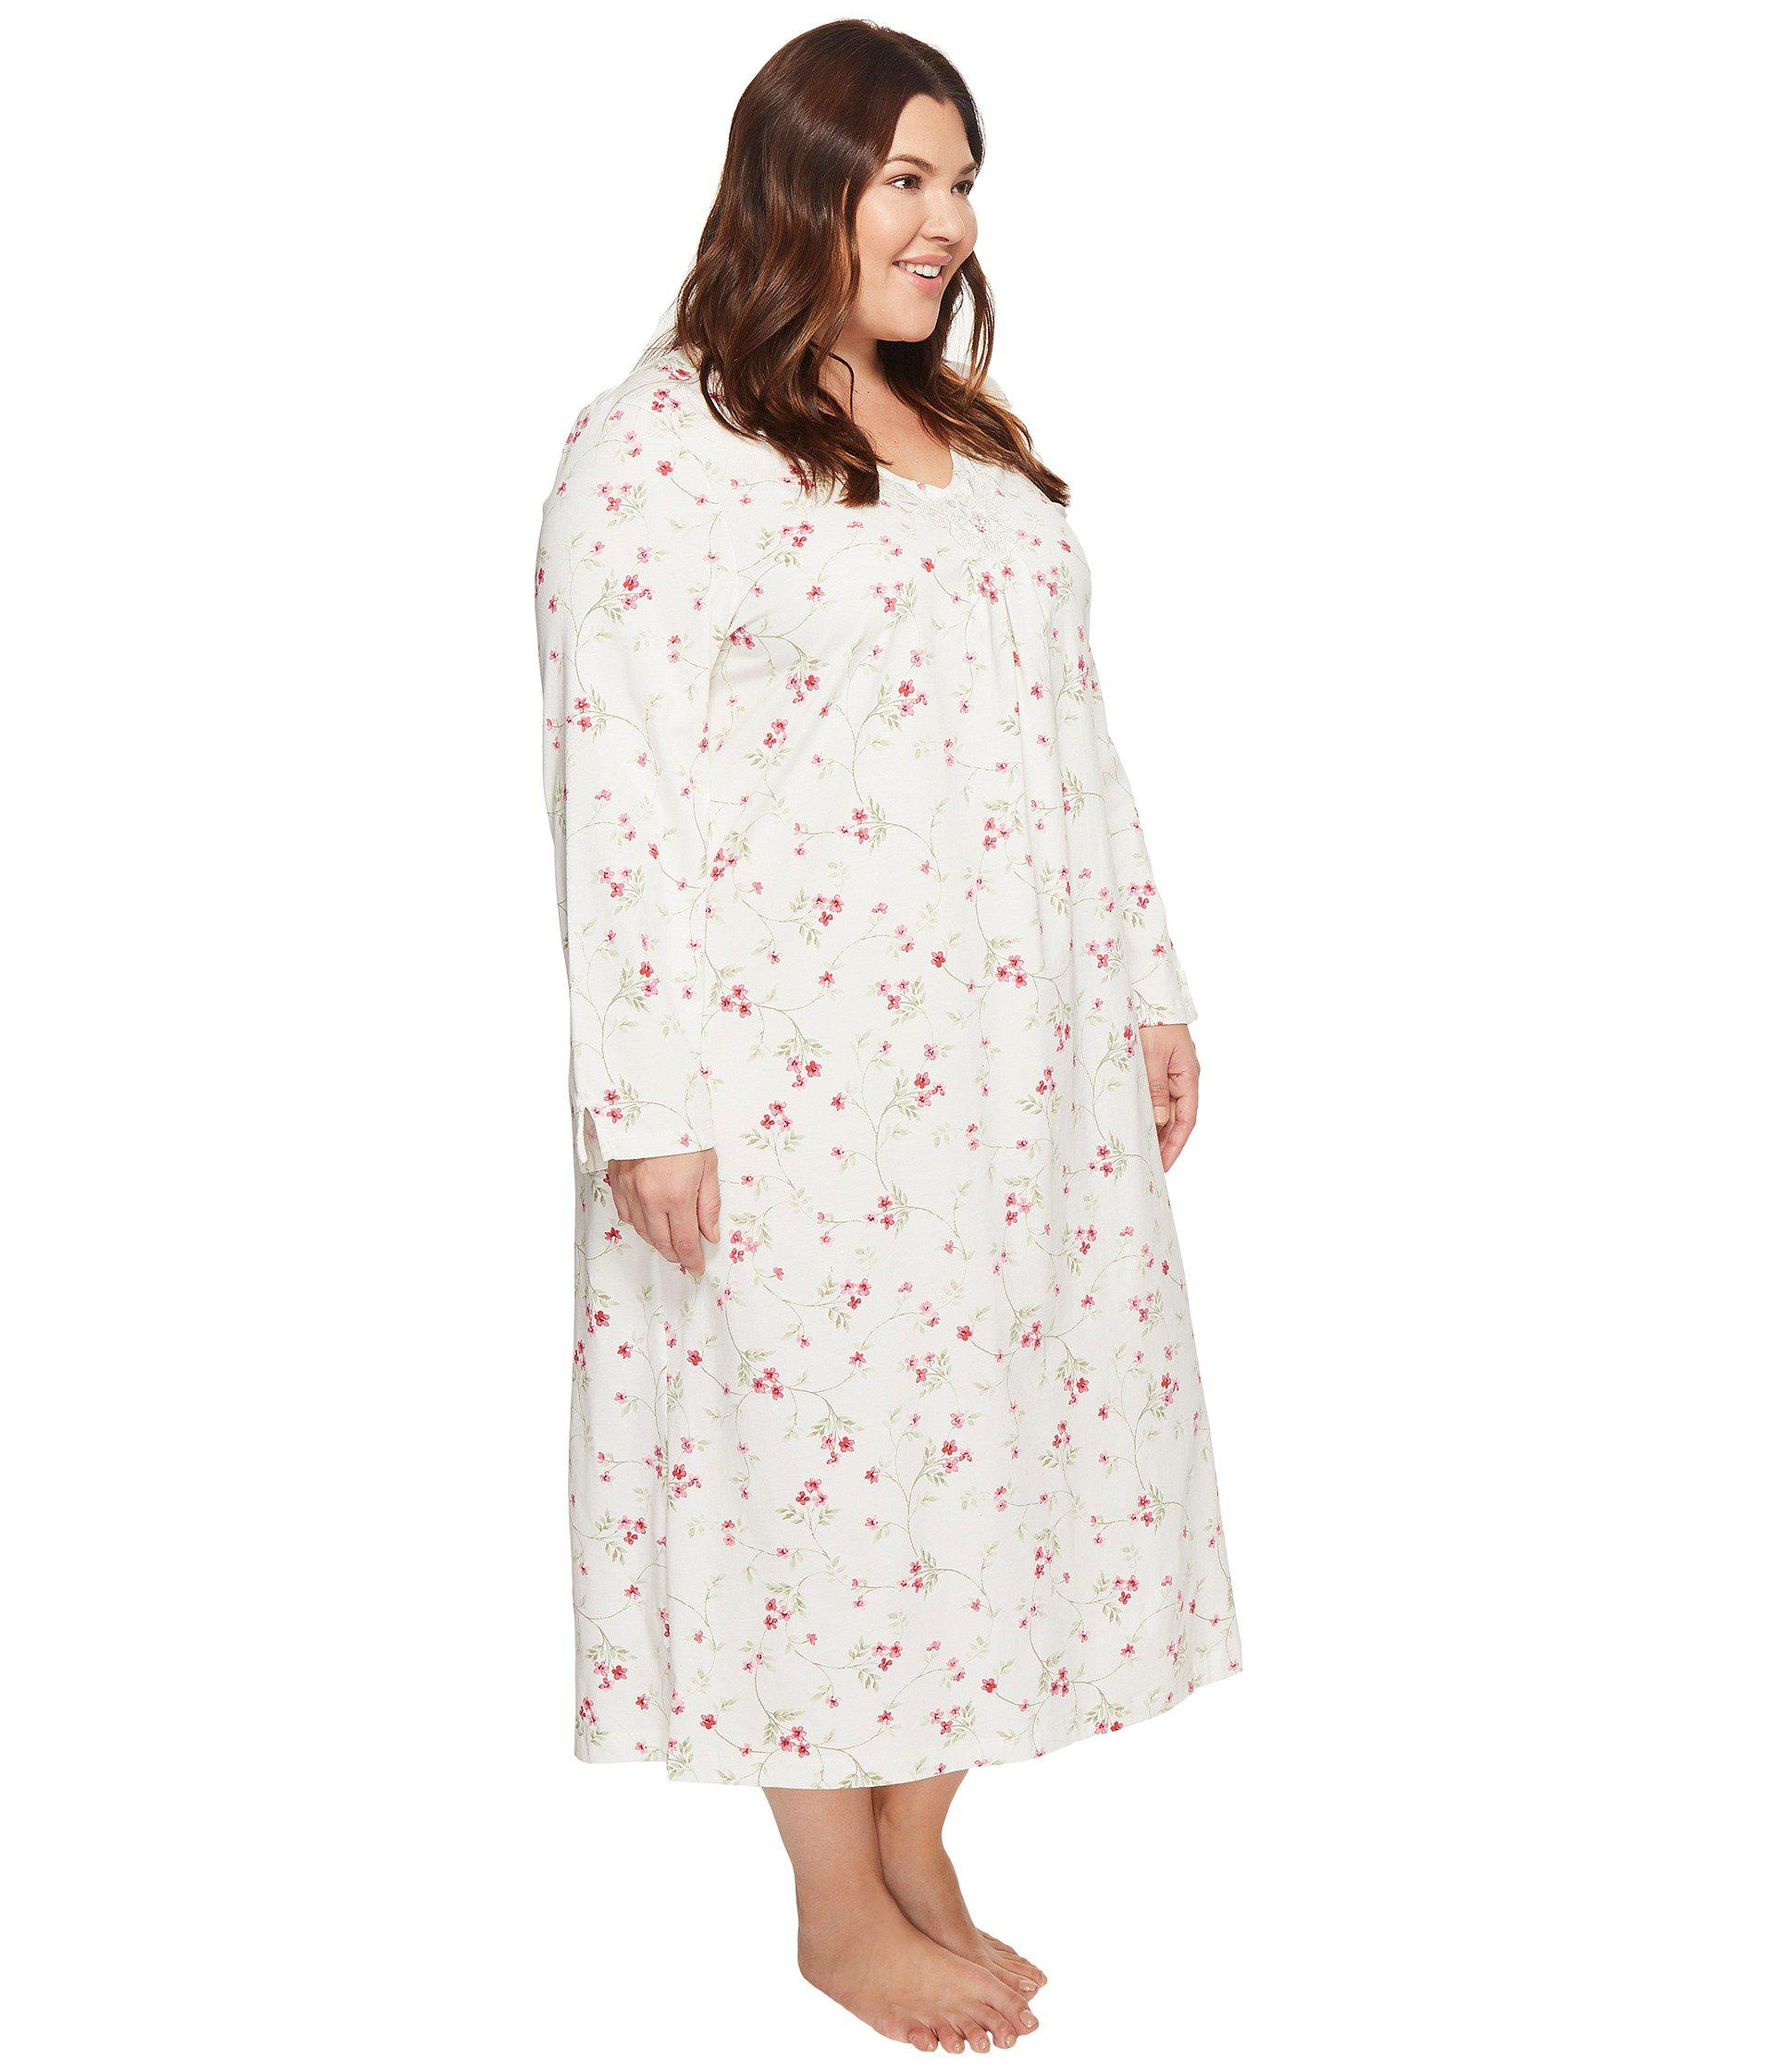 Lyst - Carole Hochman Plus Size Soft Jersey Floral Long Gown